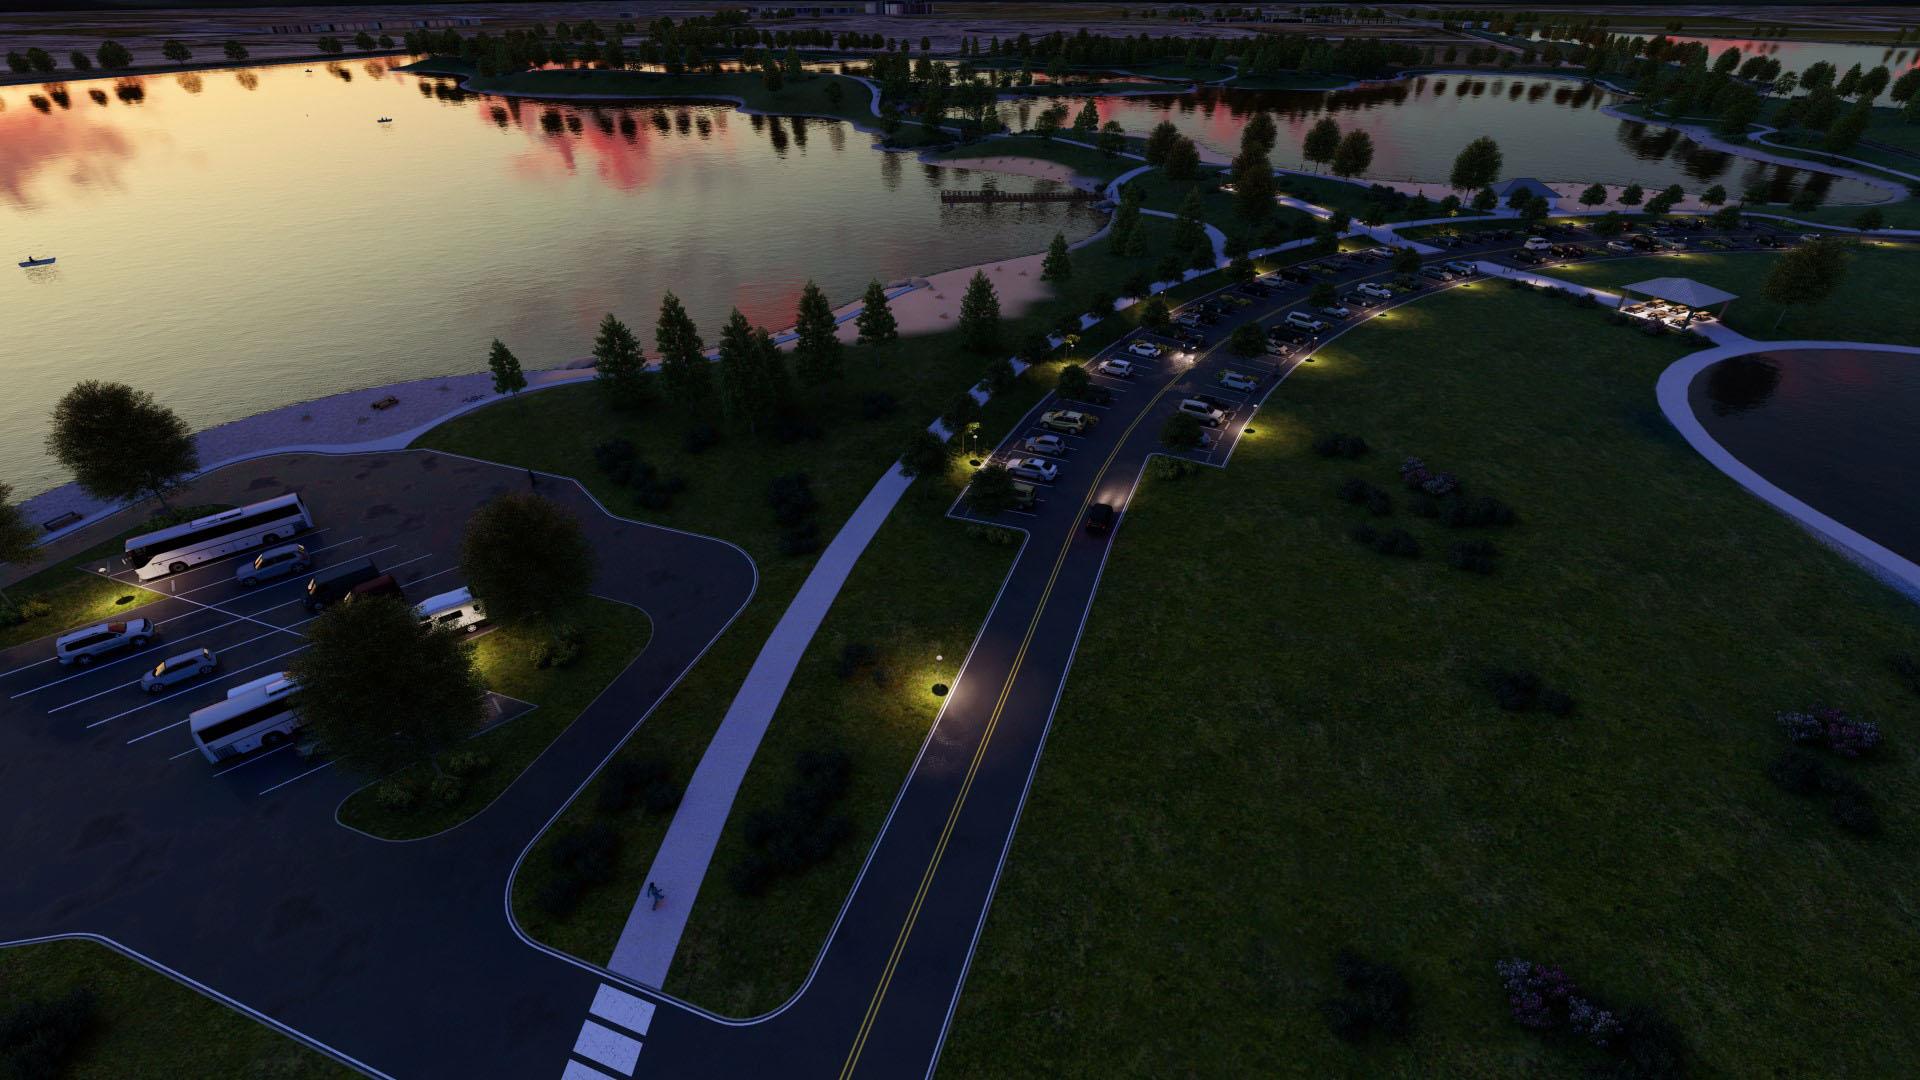 CITYLAKES NIGHT 1920x1080 08.jpg